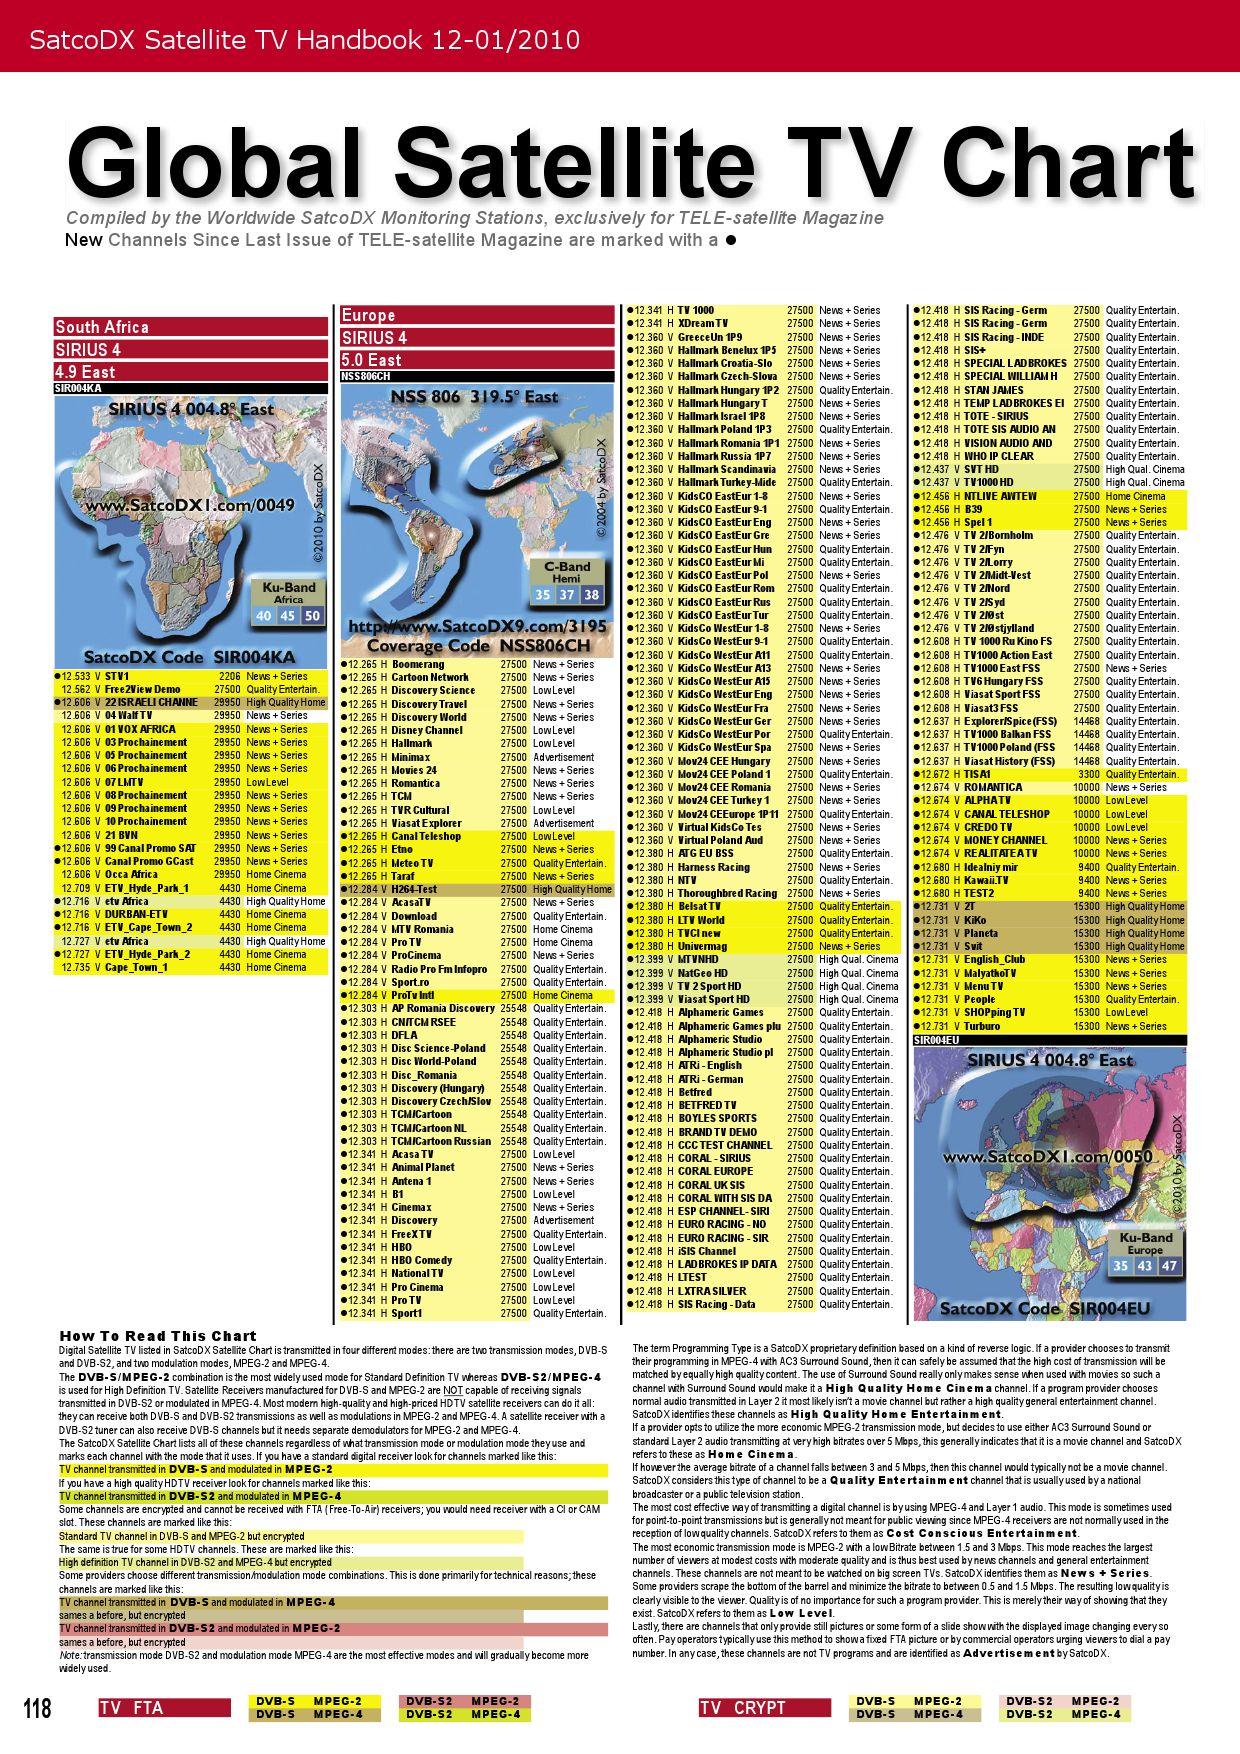 SATCODX V3.12 TÉLÉCHARGER II